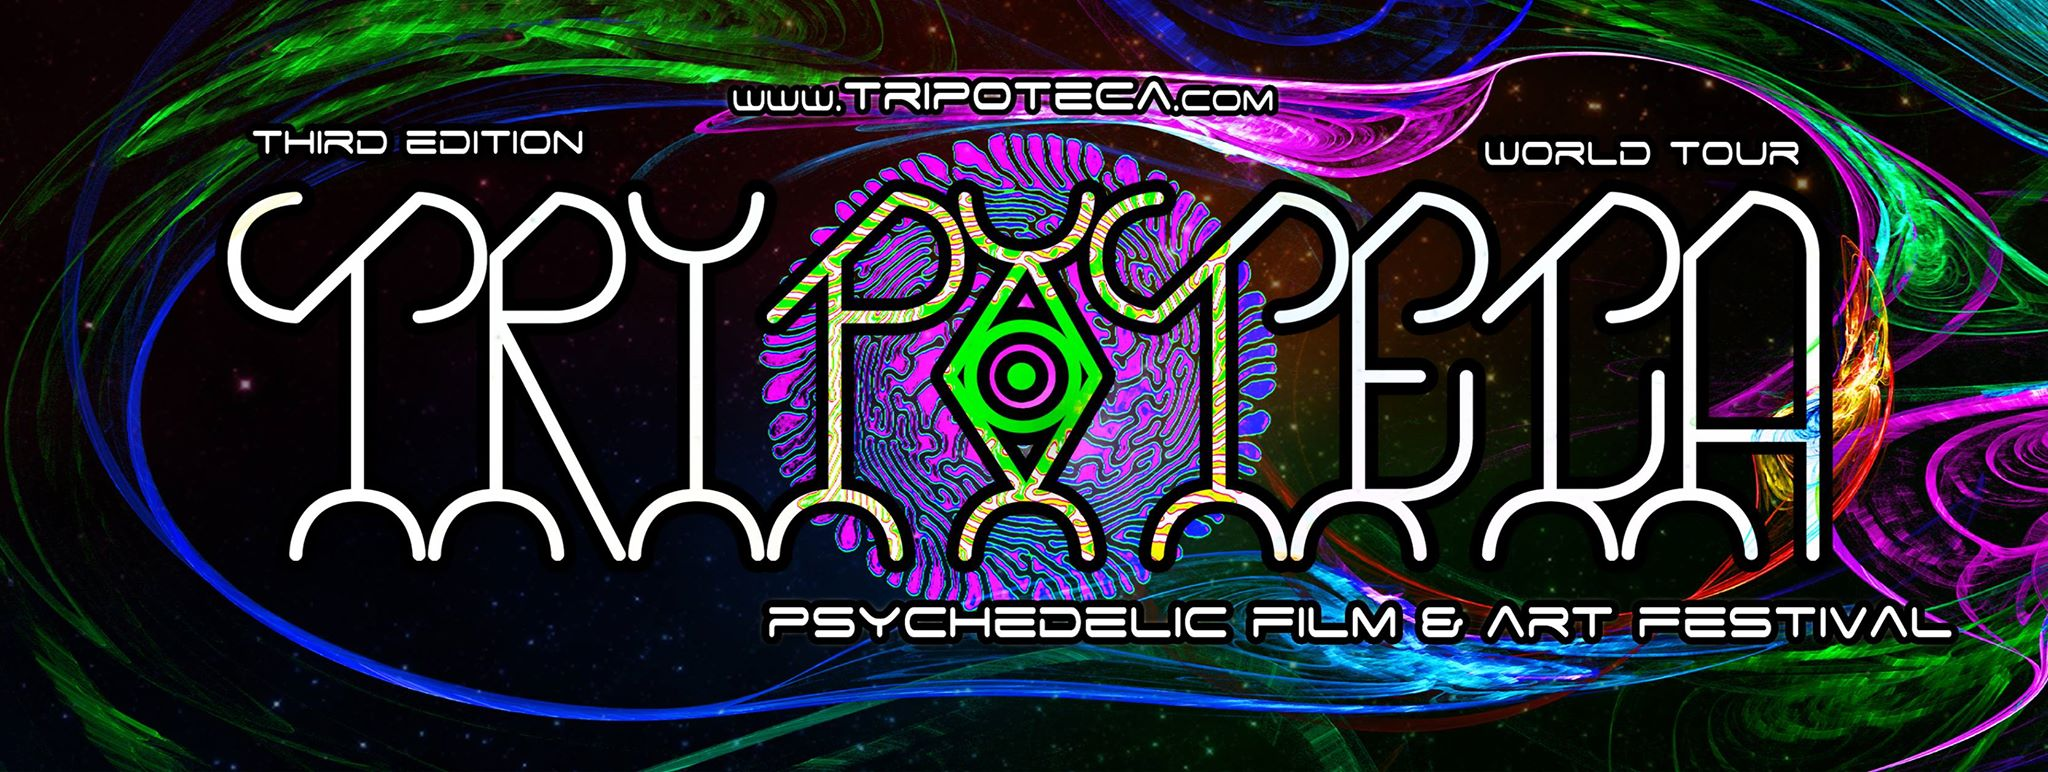 Psychedelic Video Festival – Tripoteca near you ?